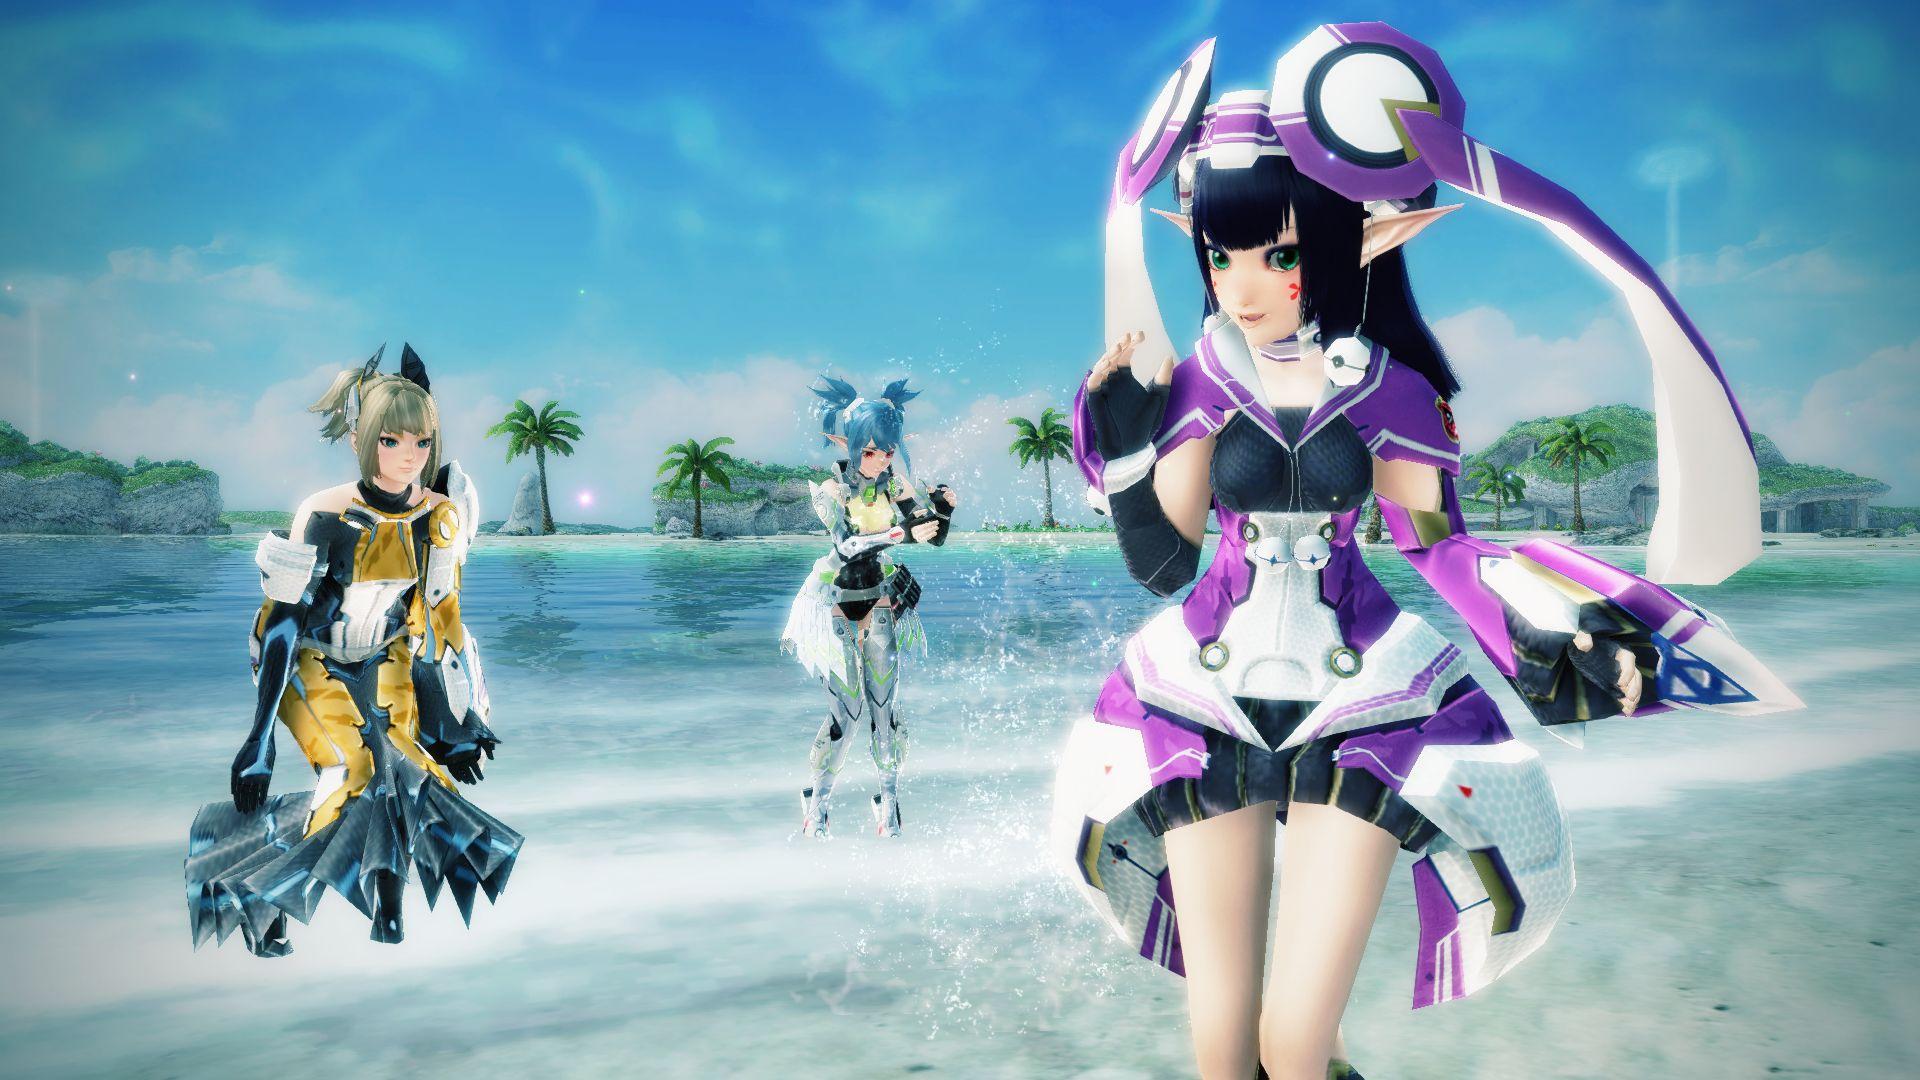 Phantasy star online 2 lisa